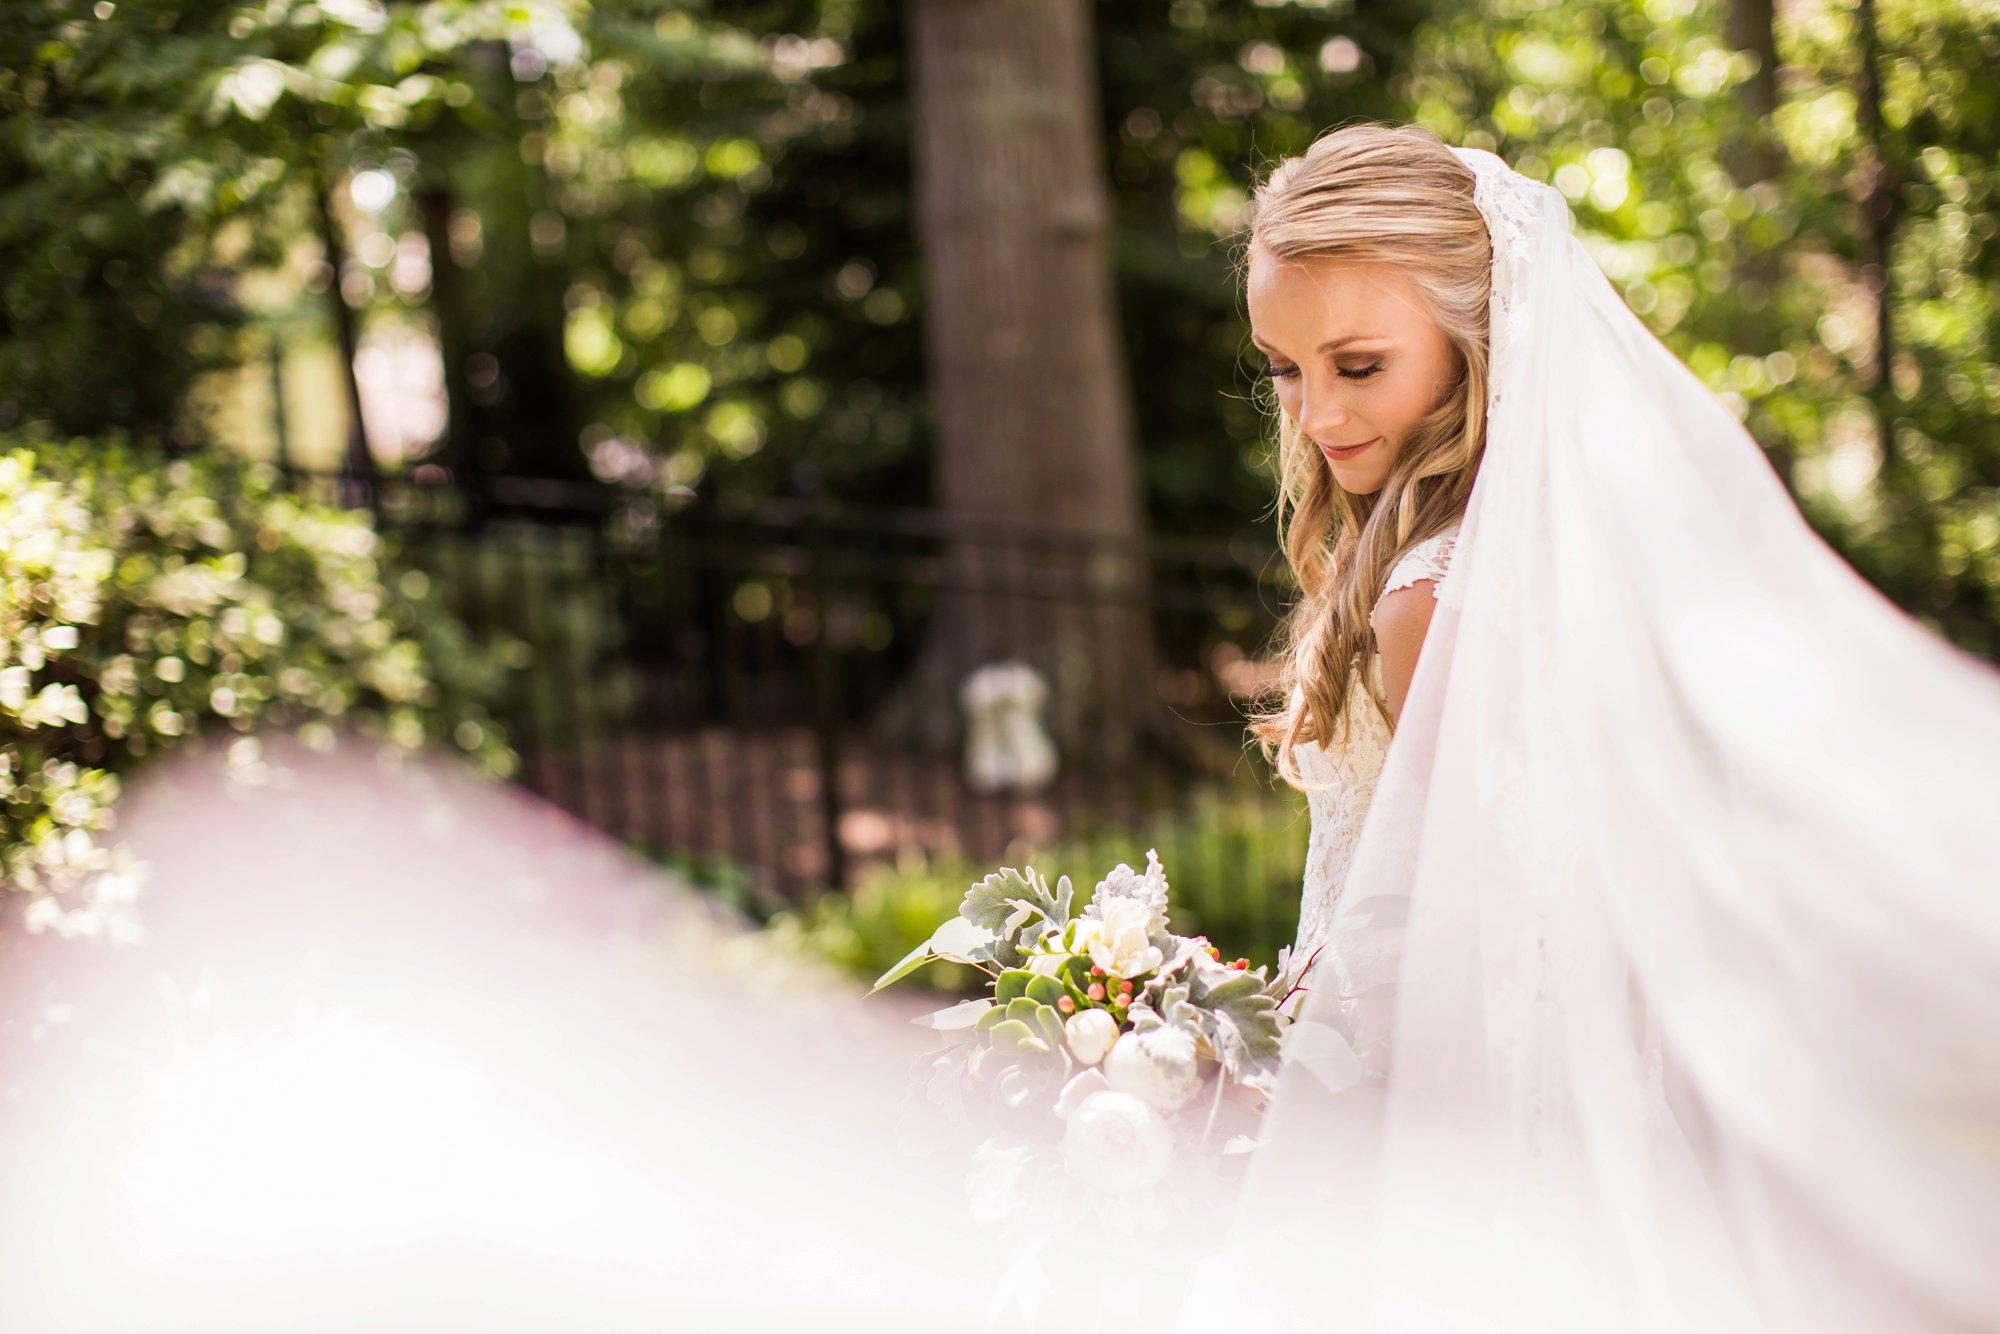 wedding-photography-88-love-stories_0014.jpg